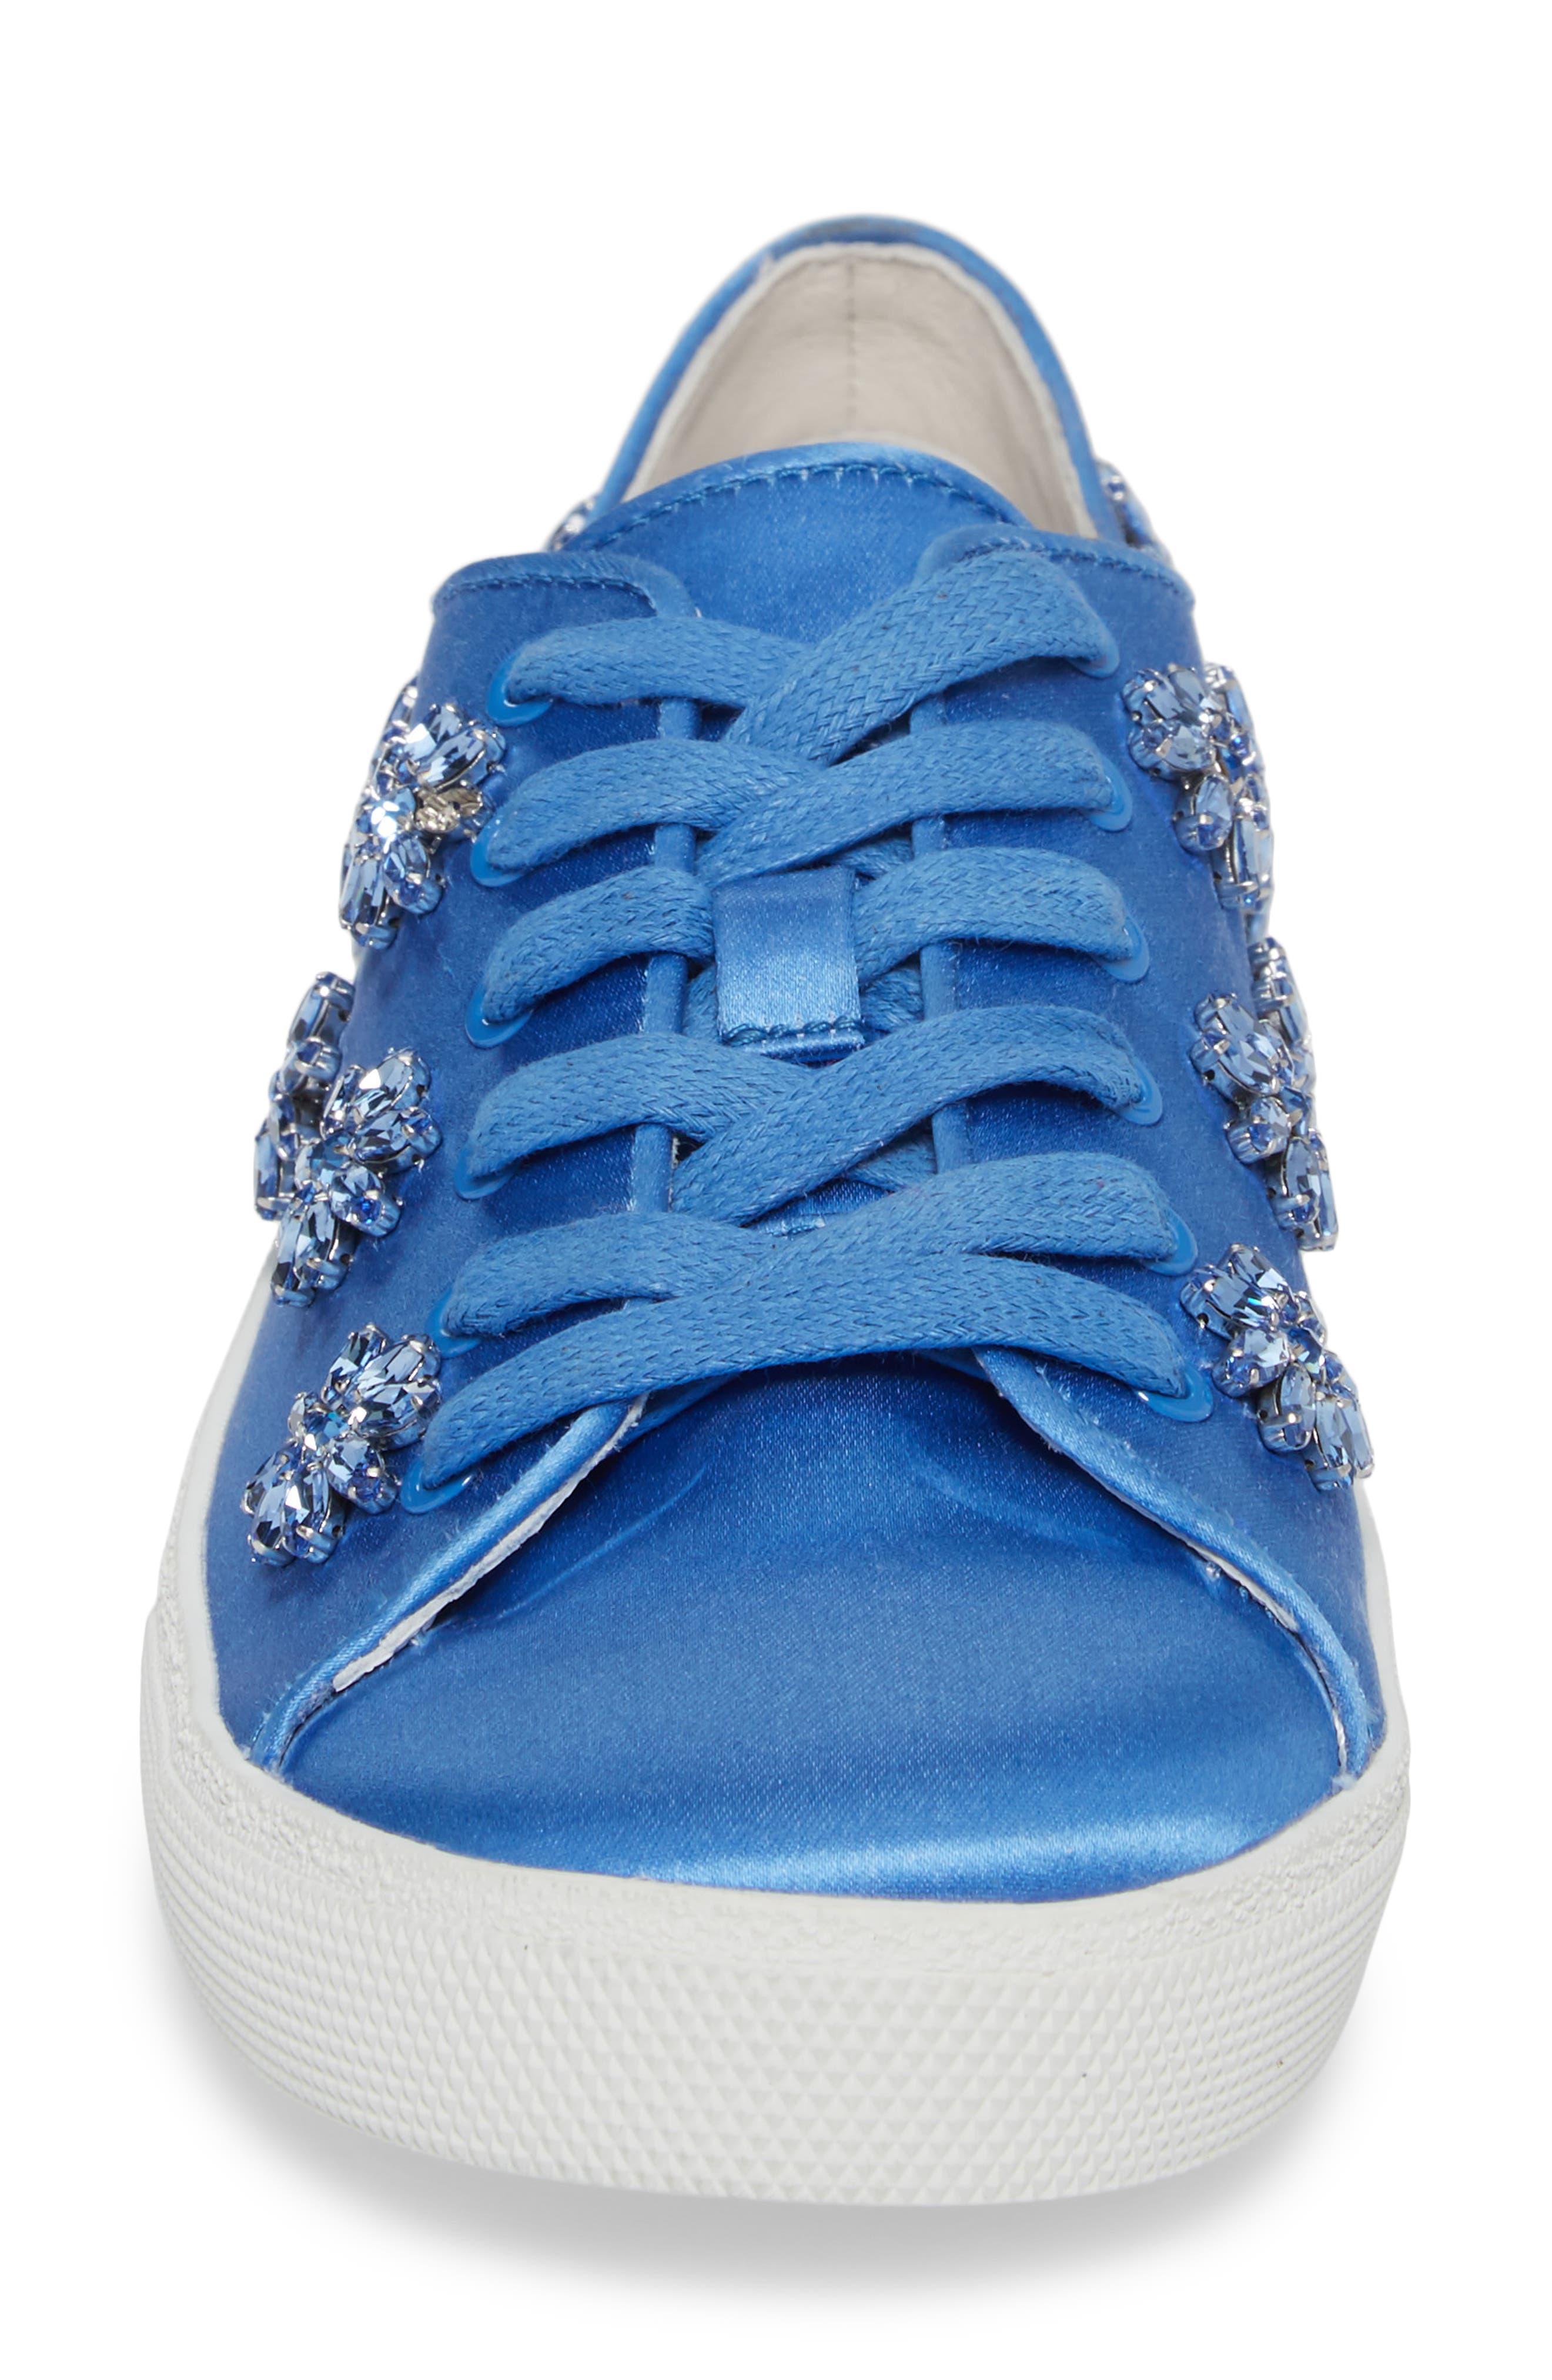 Cleo Crystal Embellished Sneaker,                             Alternate thumbnail 4, color,                             Cerulean